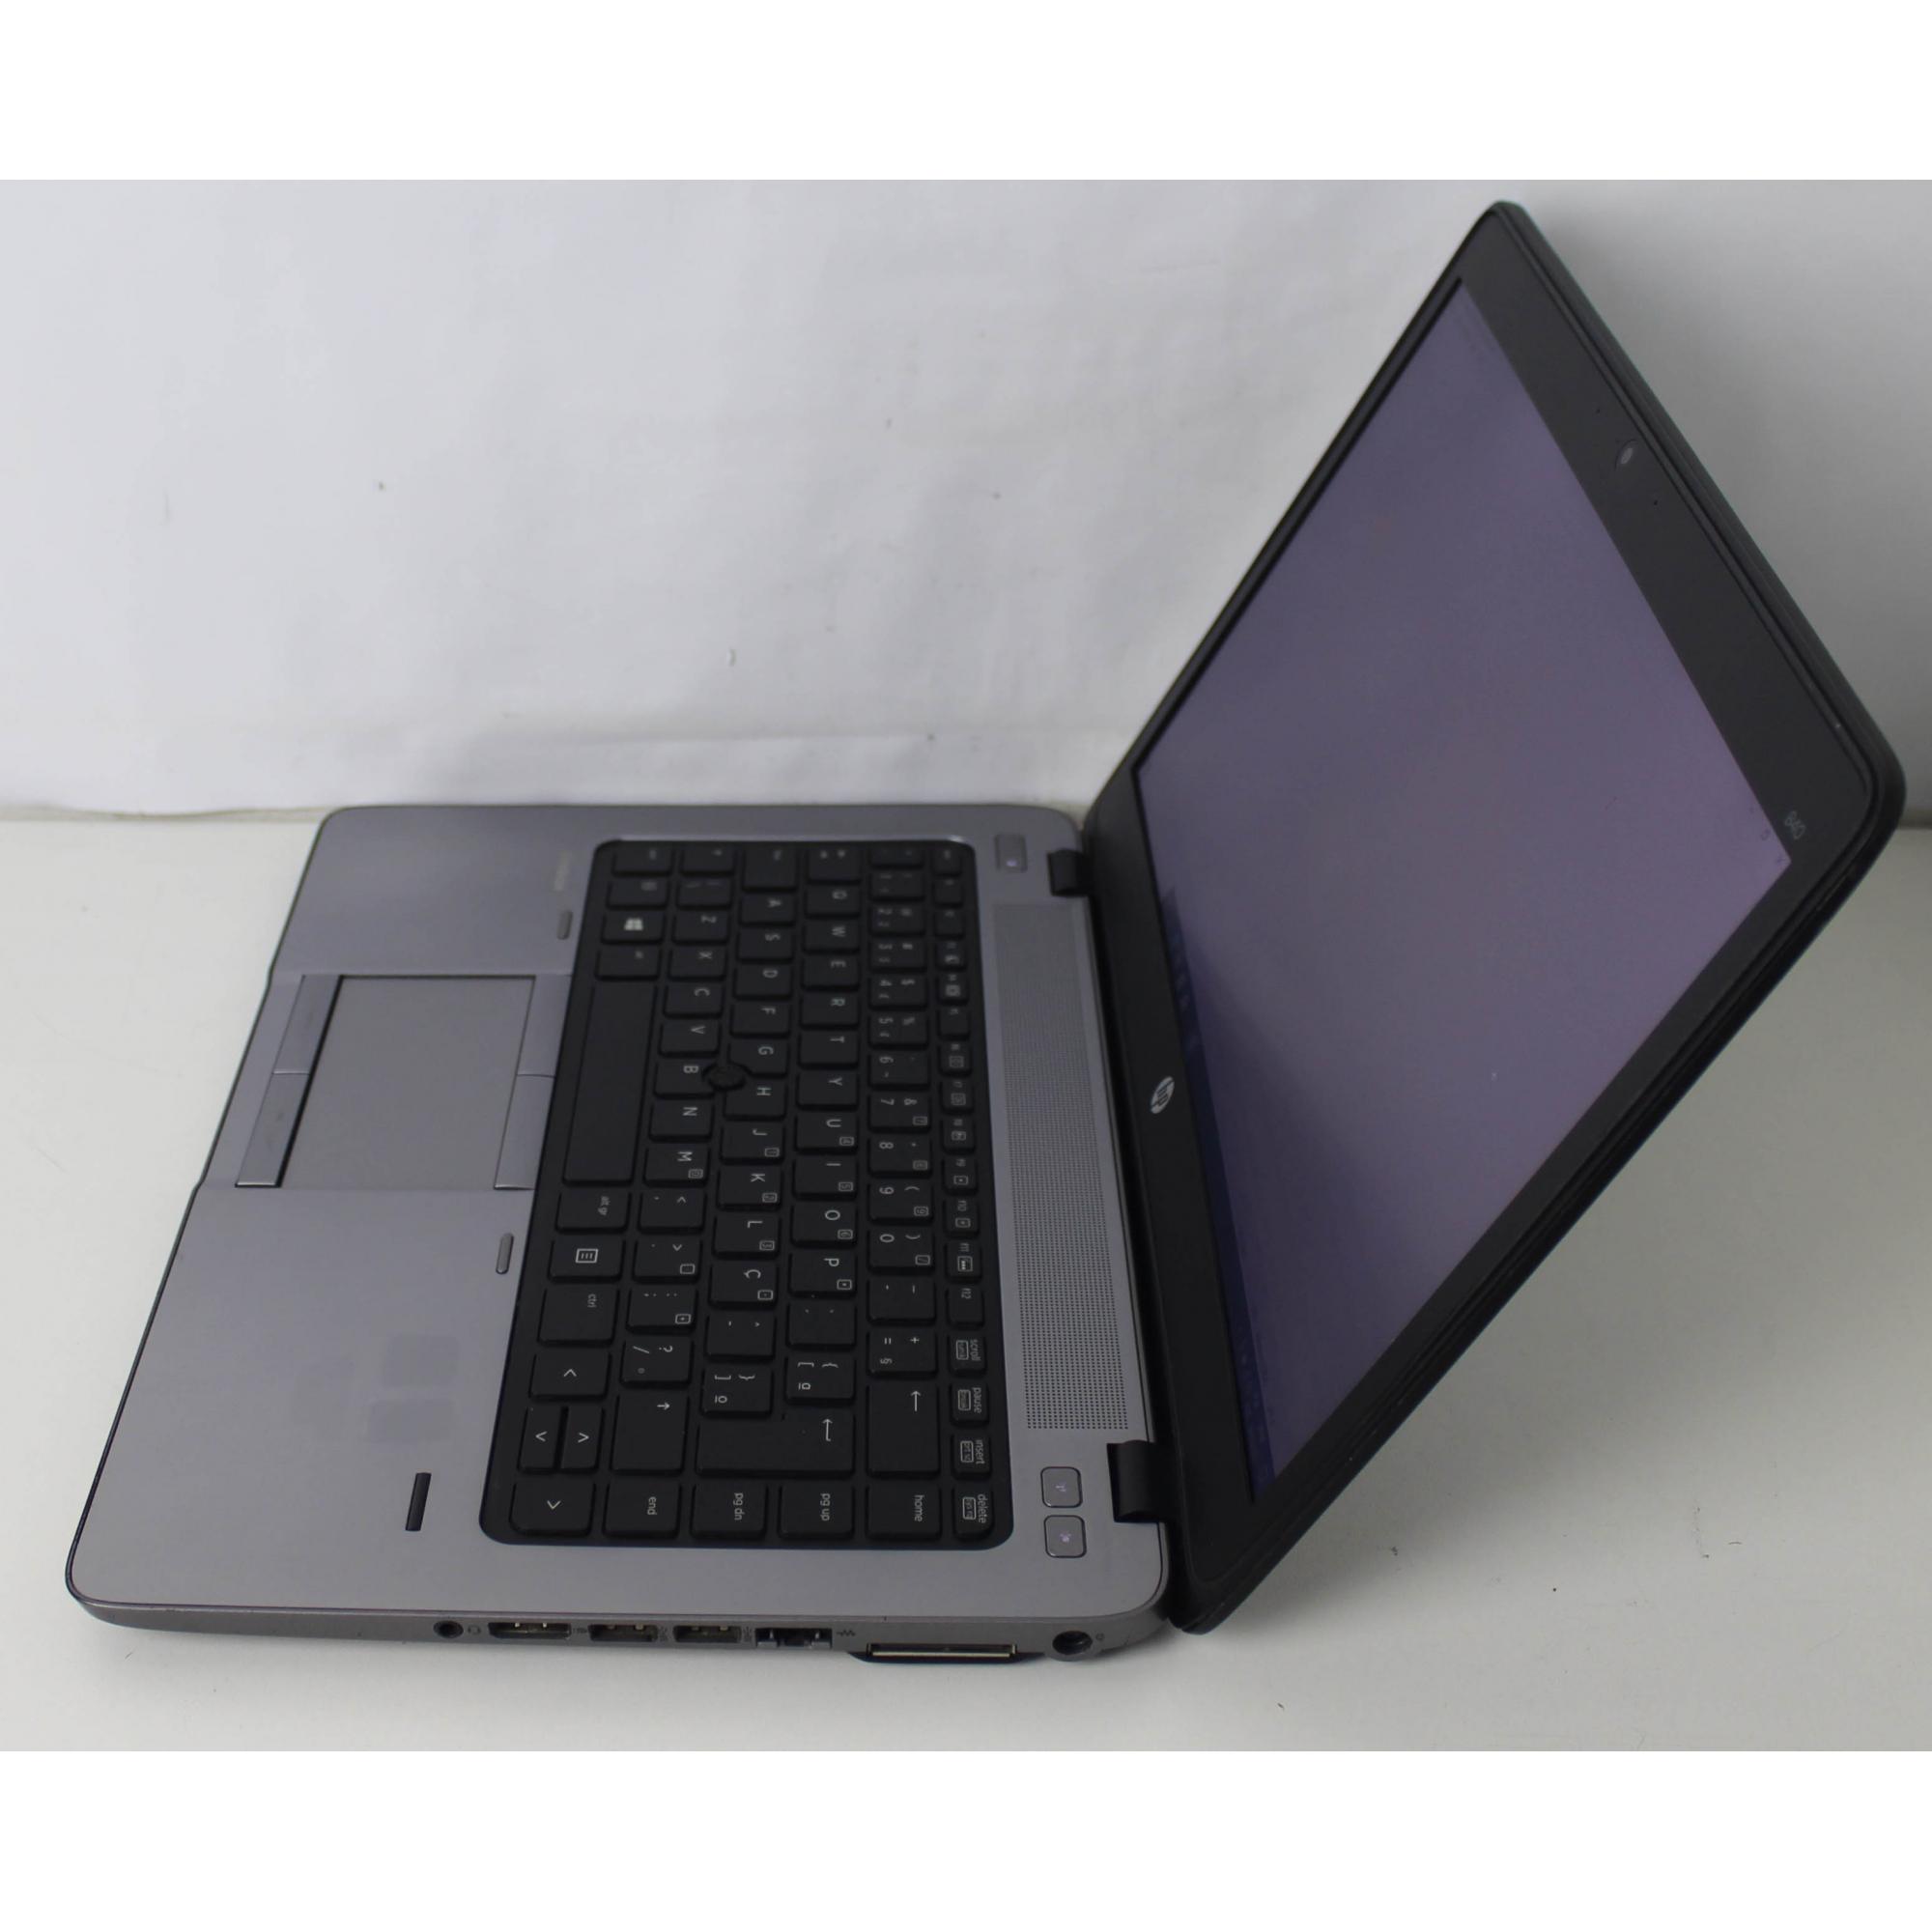 "NOTEBOOK HP ELITEBOOK 840G1 14"" Intel Core i5 1.9GHz 8GB HD-500GB + SSD-32GB"